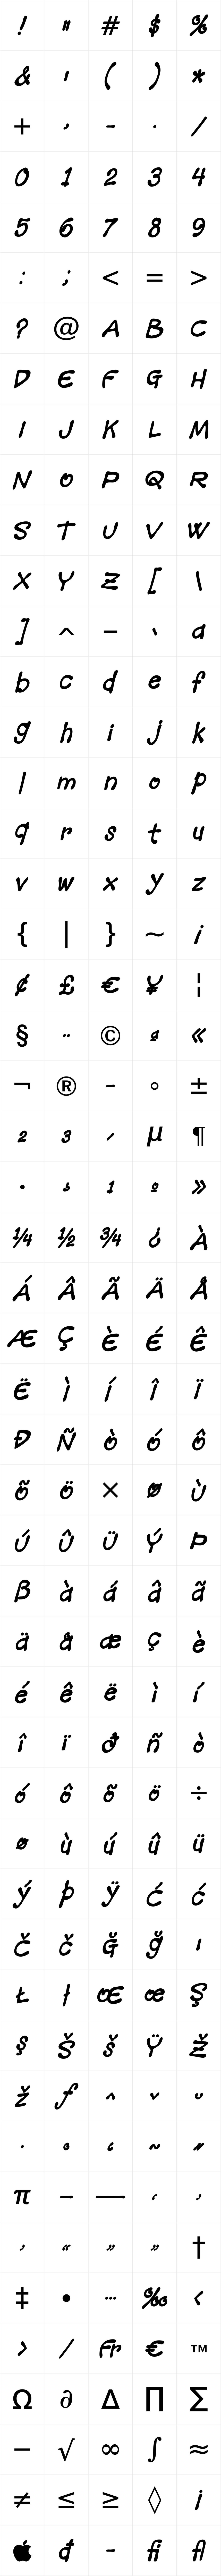 Mandingo BTN Condensed Bold Oblique